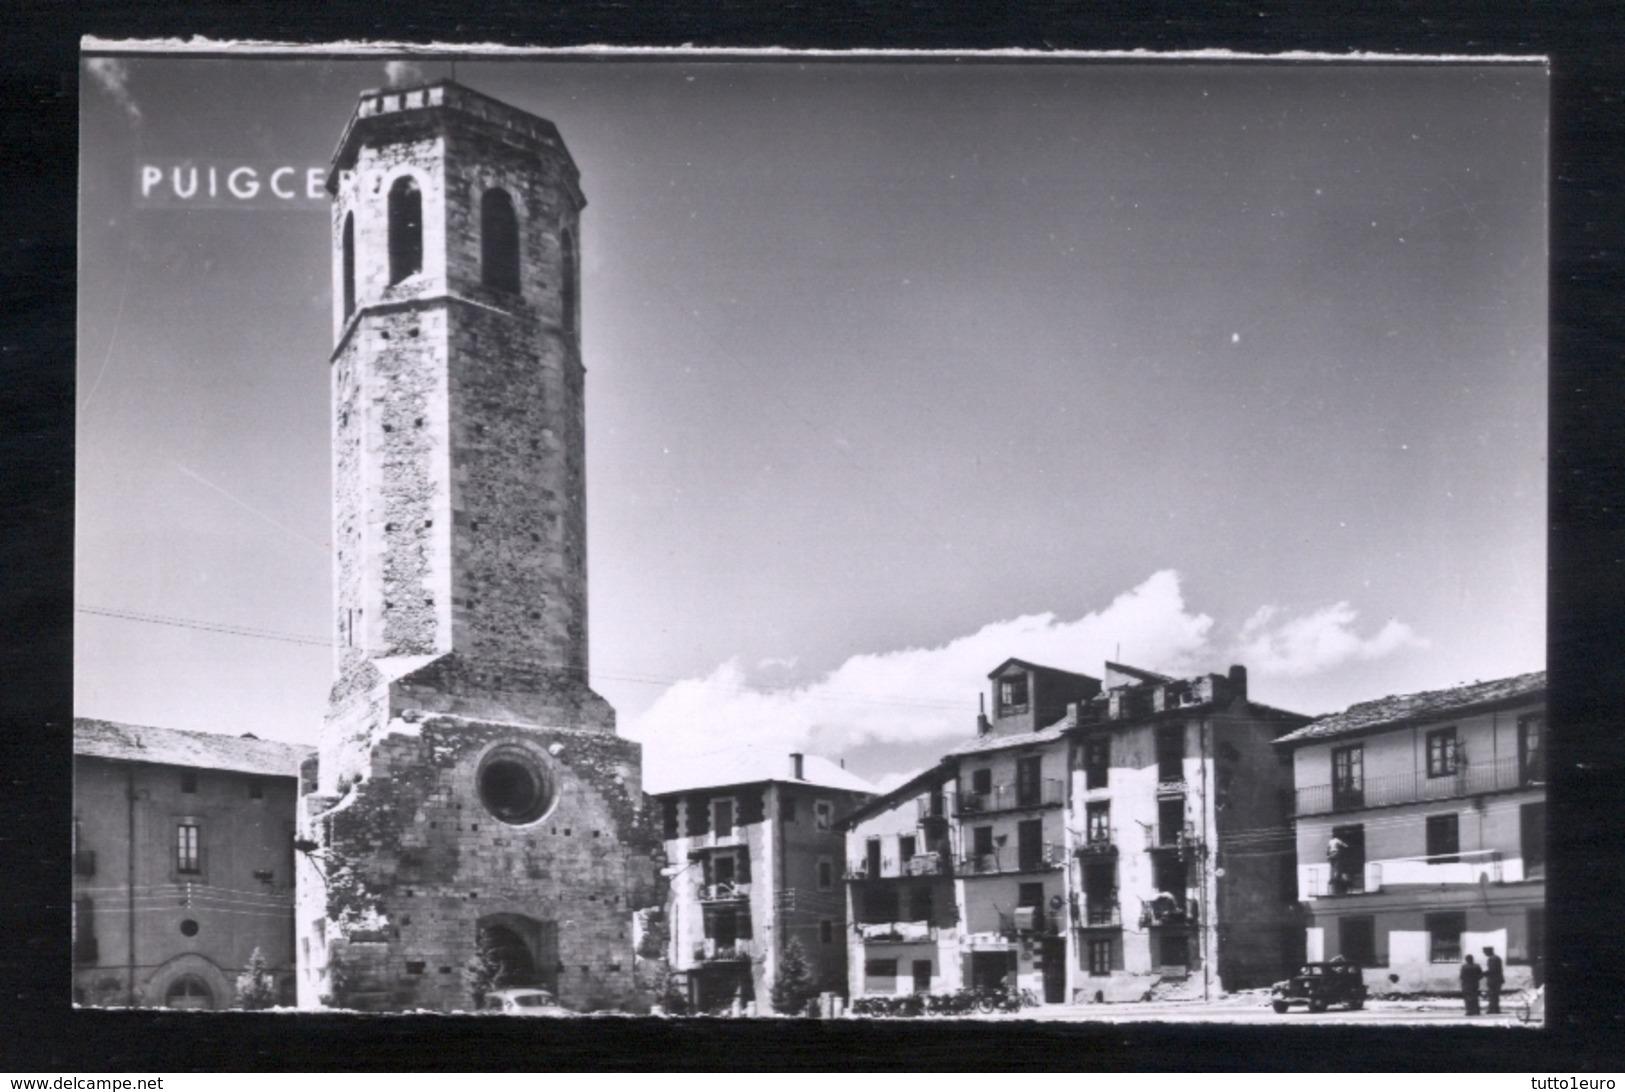 PUIGCERDA - GERONA - ANNI 50 - TORRE DE SANTA MARIA - Gerona